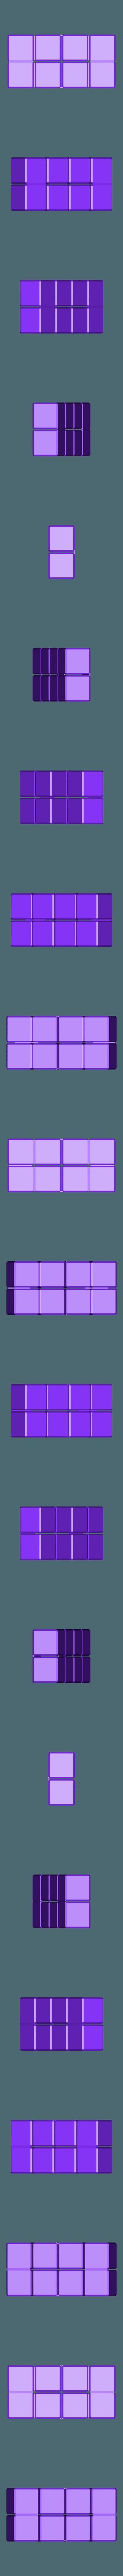 FlexibleCube30.stl Download free STL file Infinity Cube, Magic Cube, Flexible Cube, Folding Cube for Flexible TPU filament • 3D printing template, LGBU